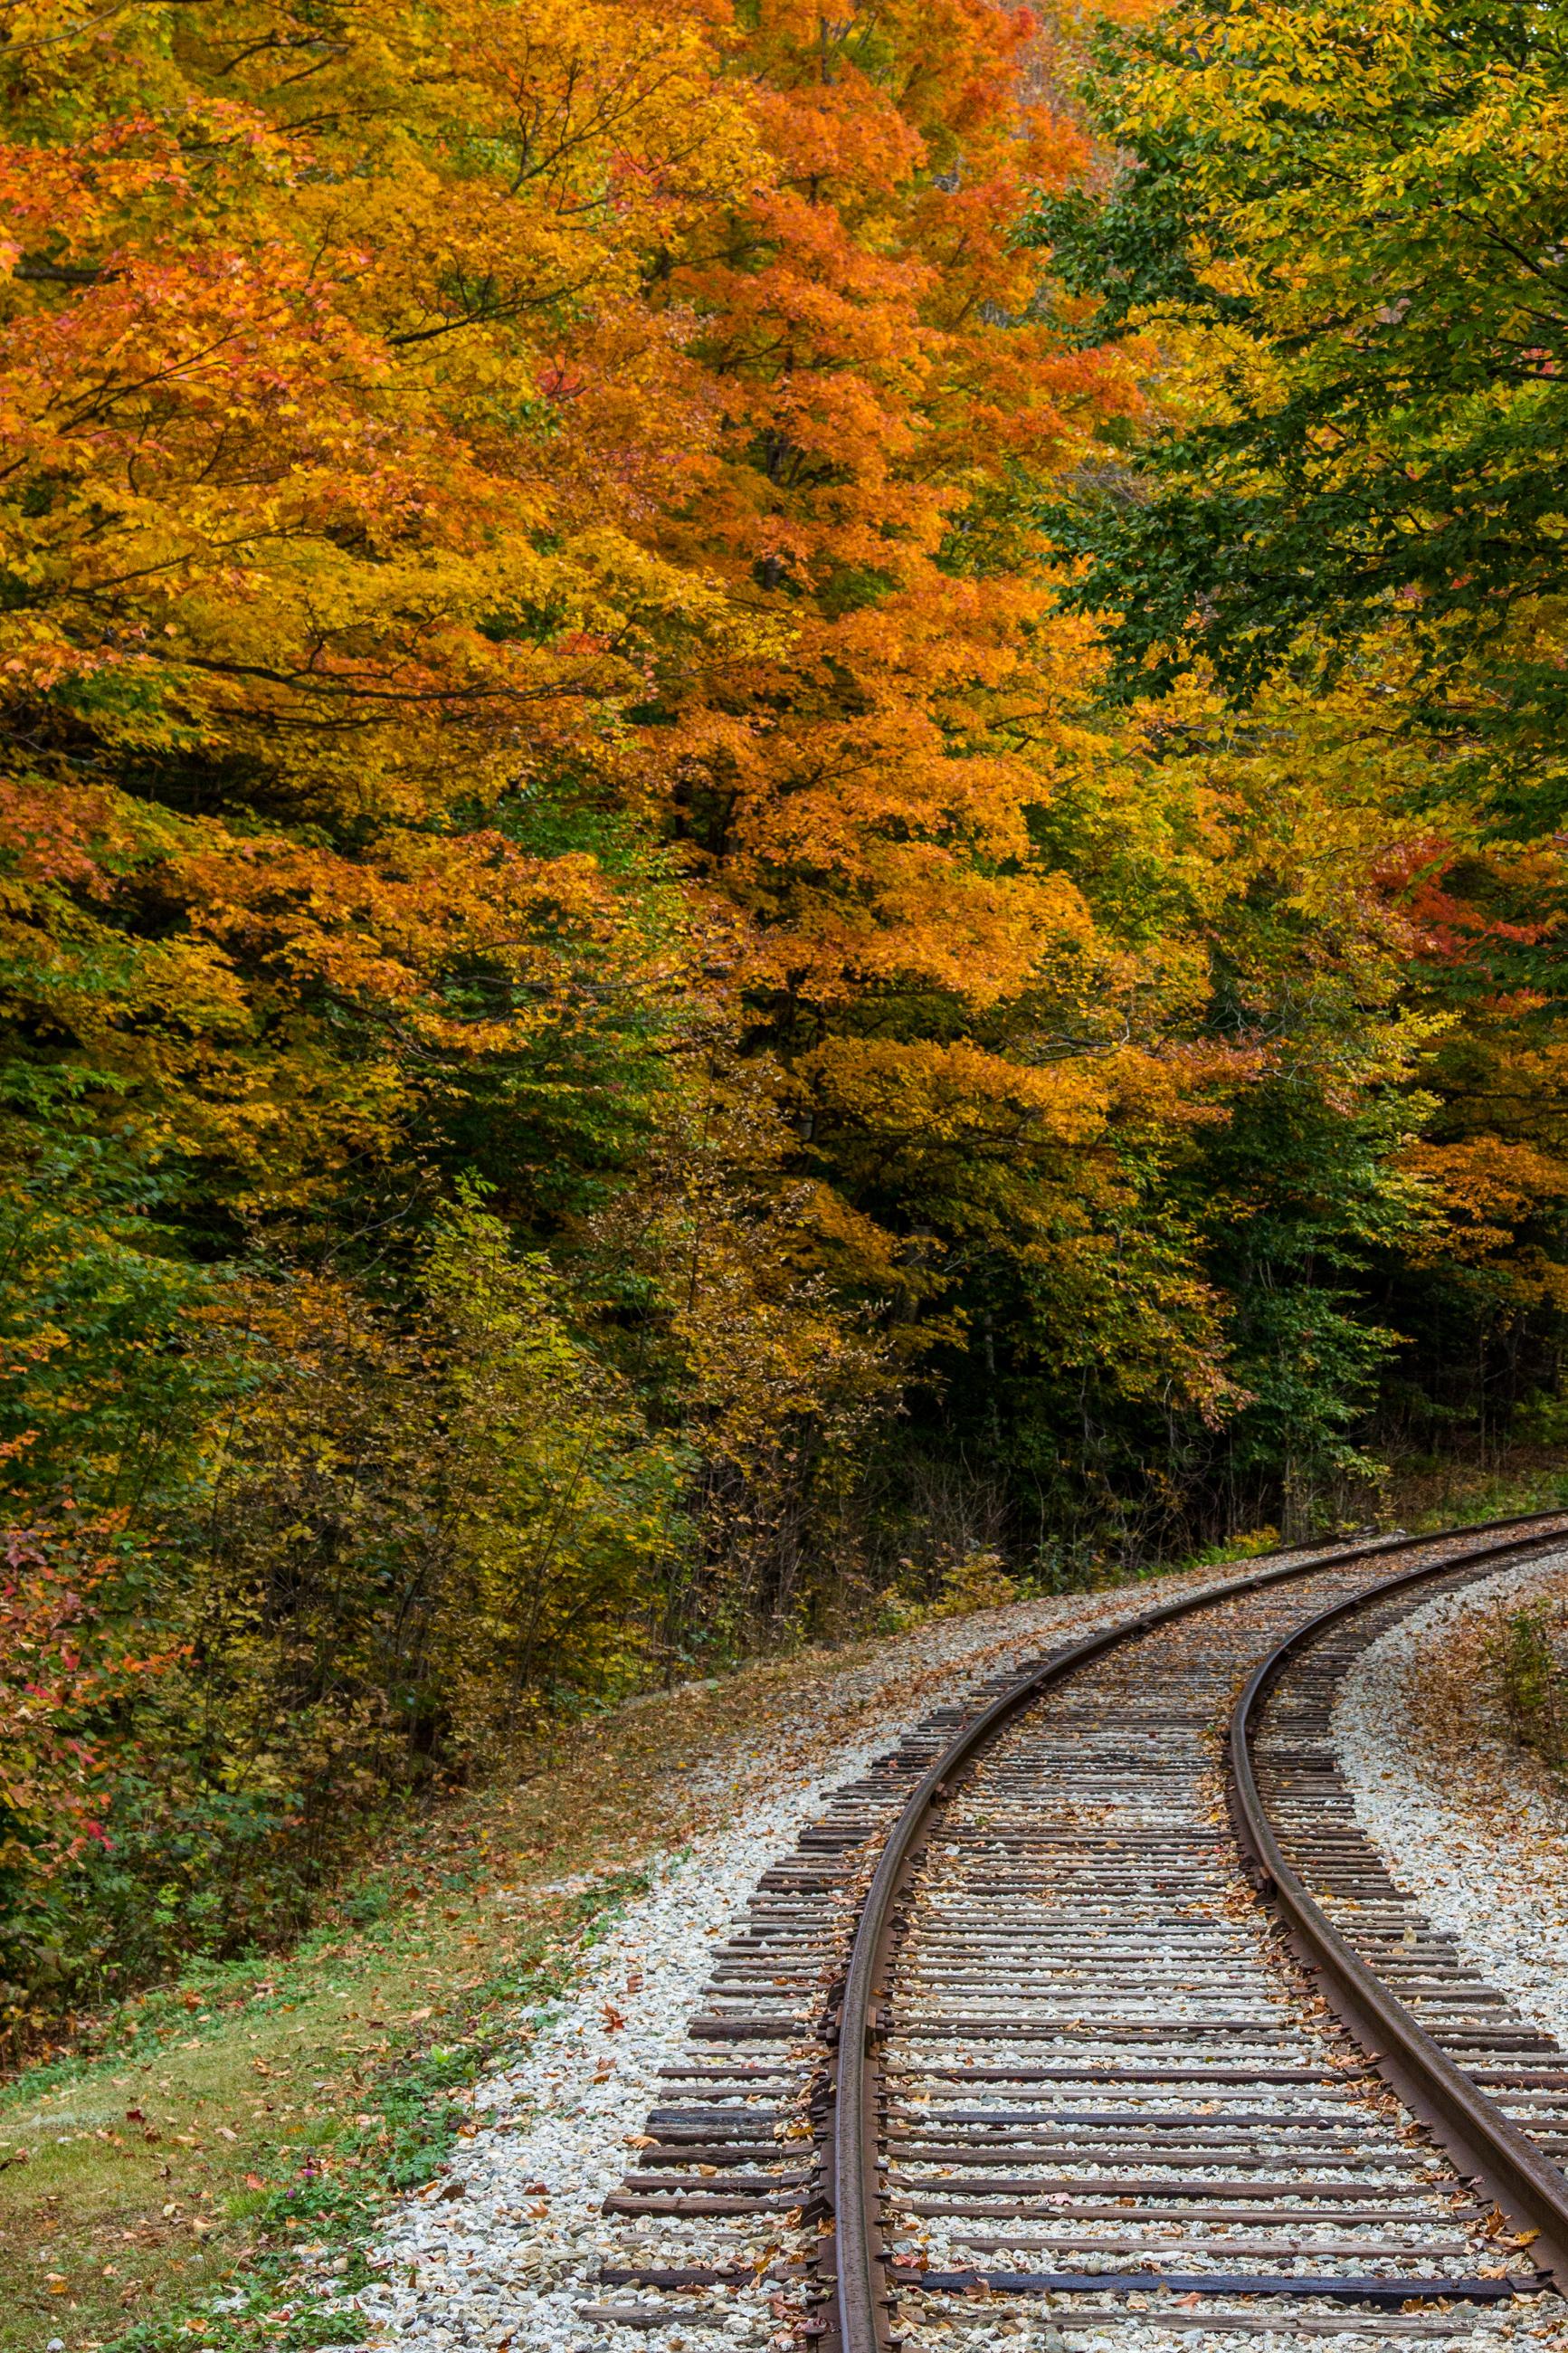 Tracks Through Fall